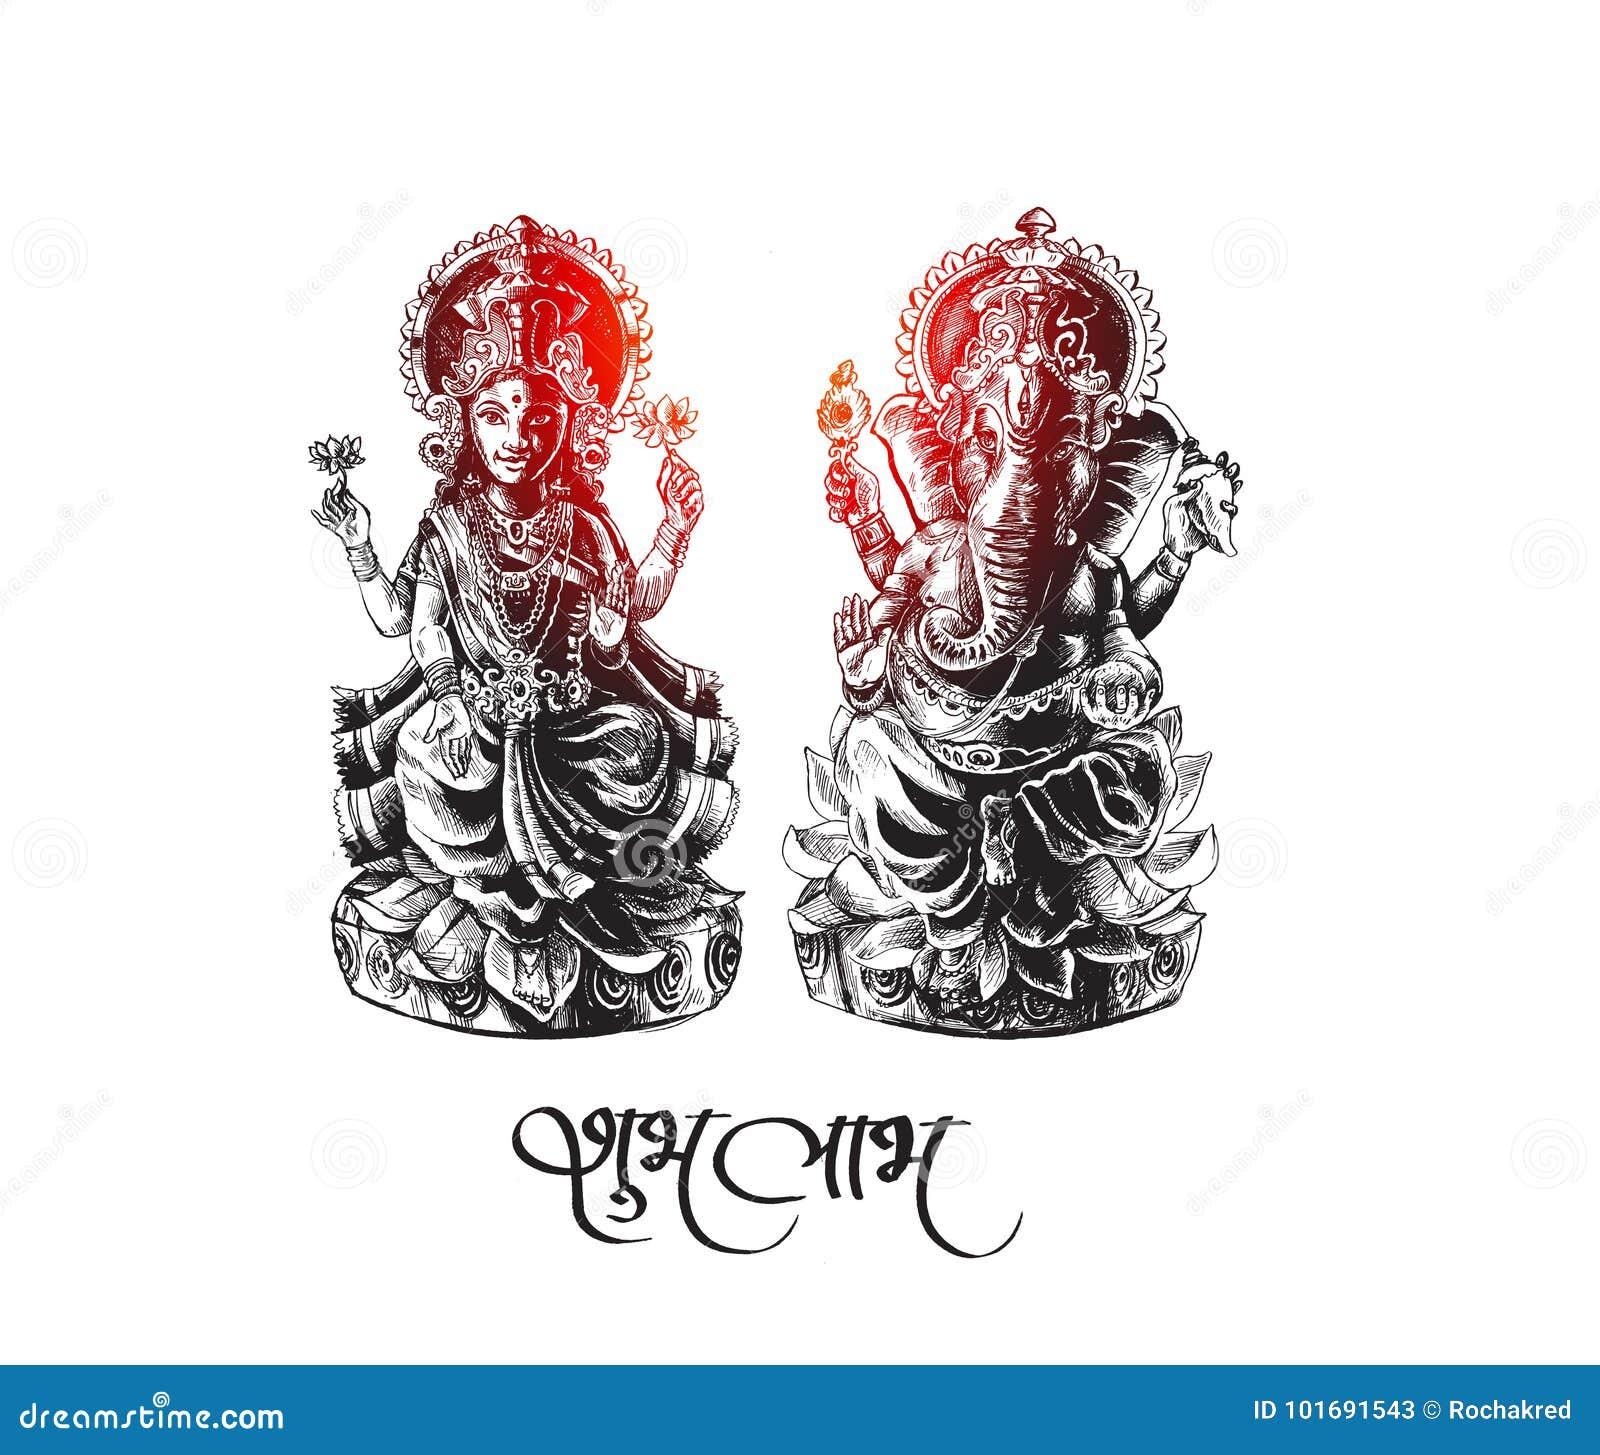 Hindu god laxmi ganesh at diwali festival stock vector